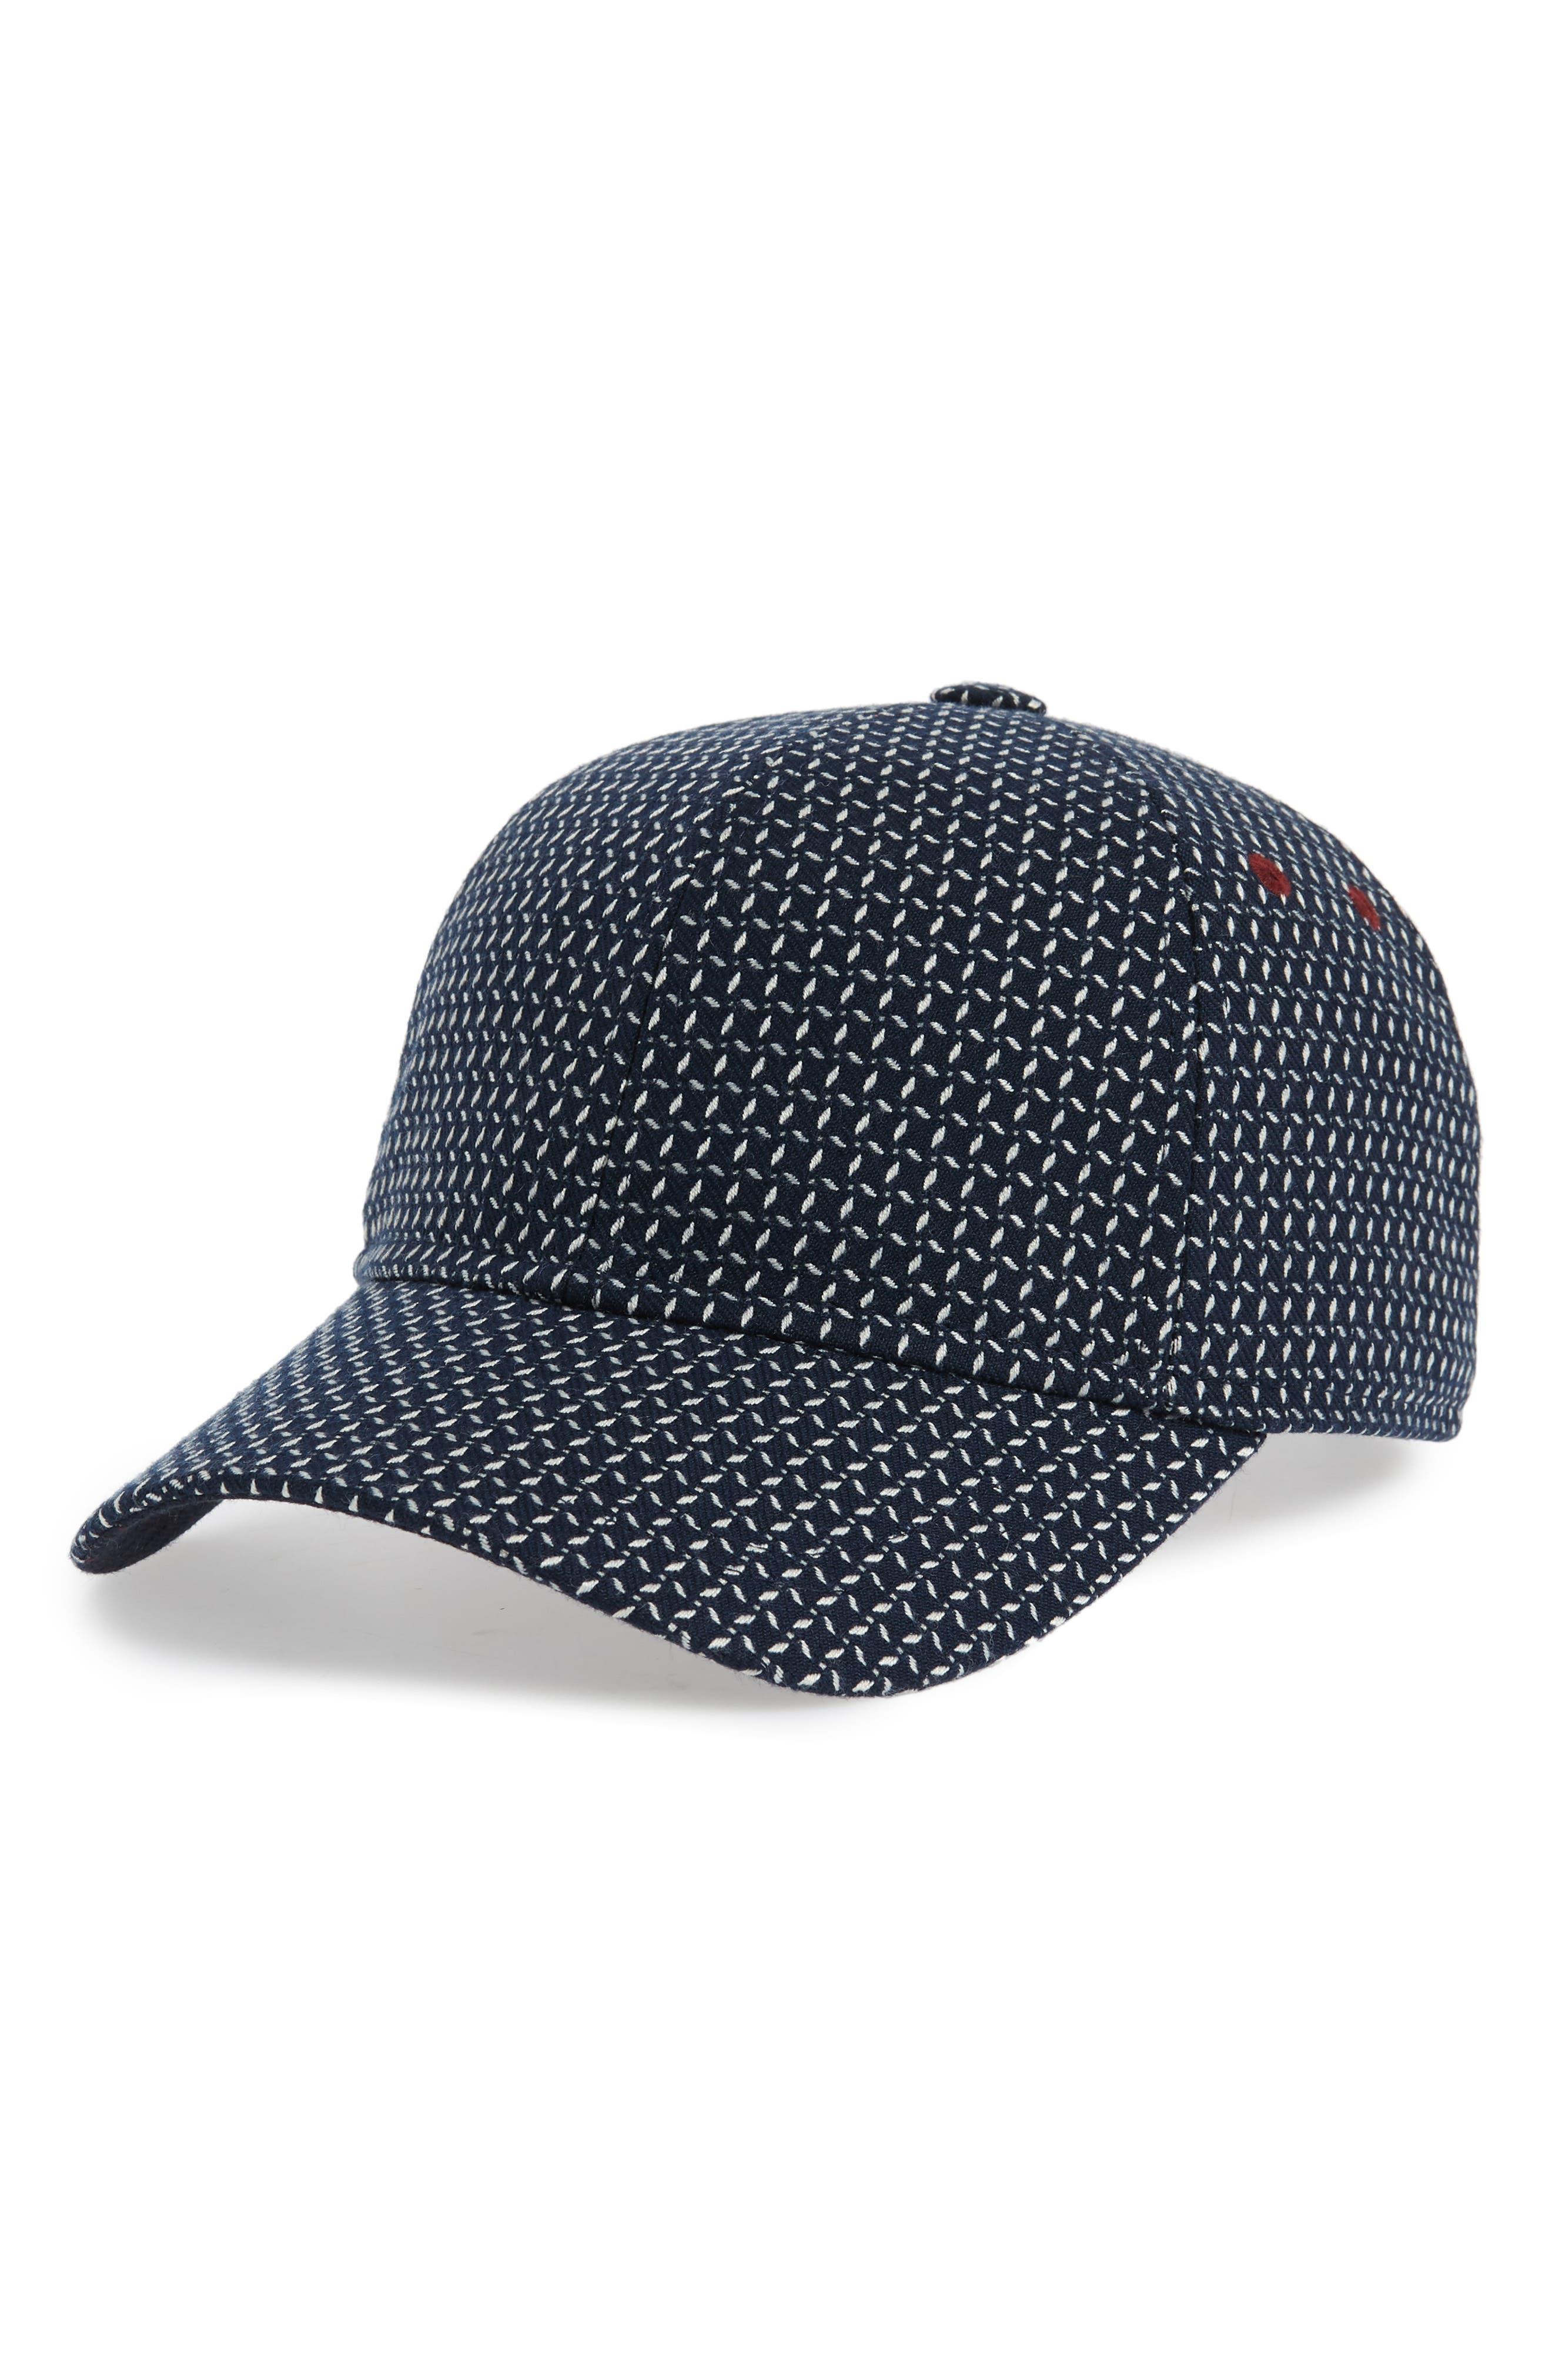 Jacquard Baseball Cap,                         Main,                         color, 410